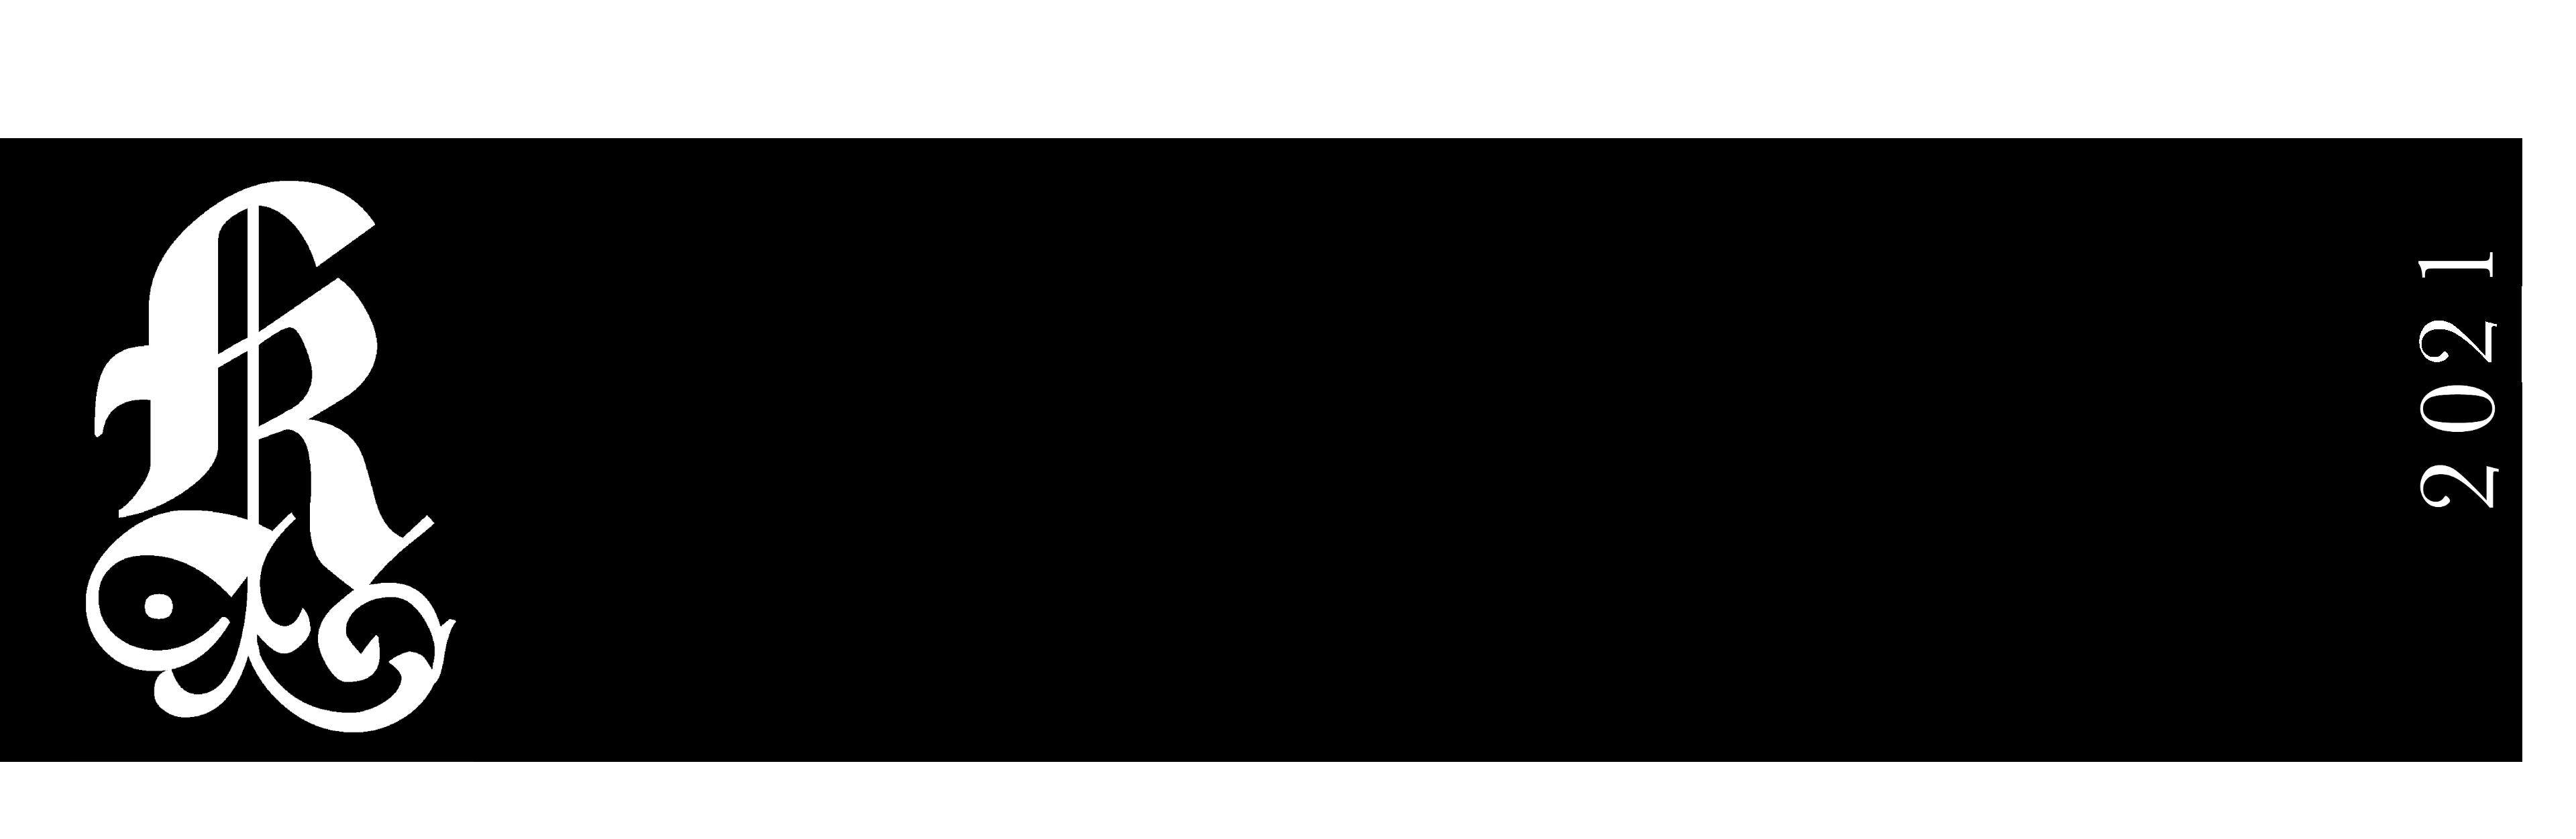 Best-50-logo-B&W